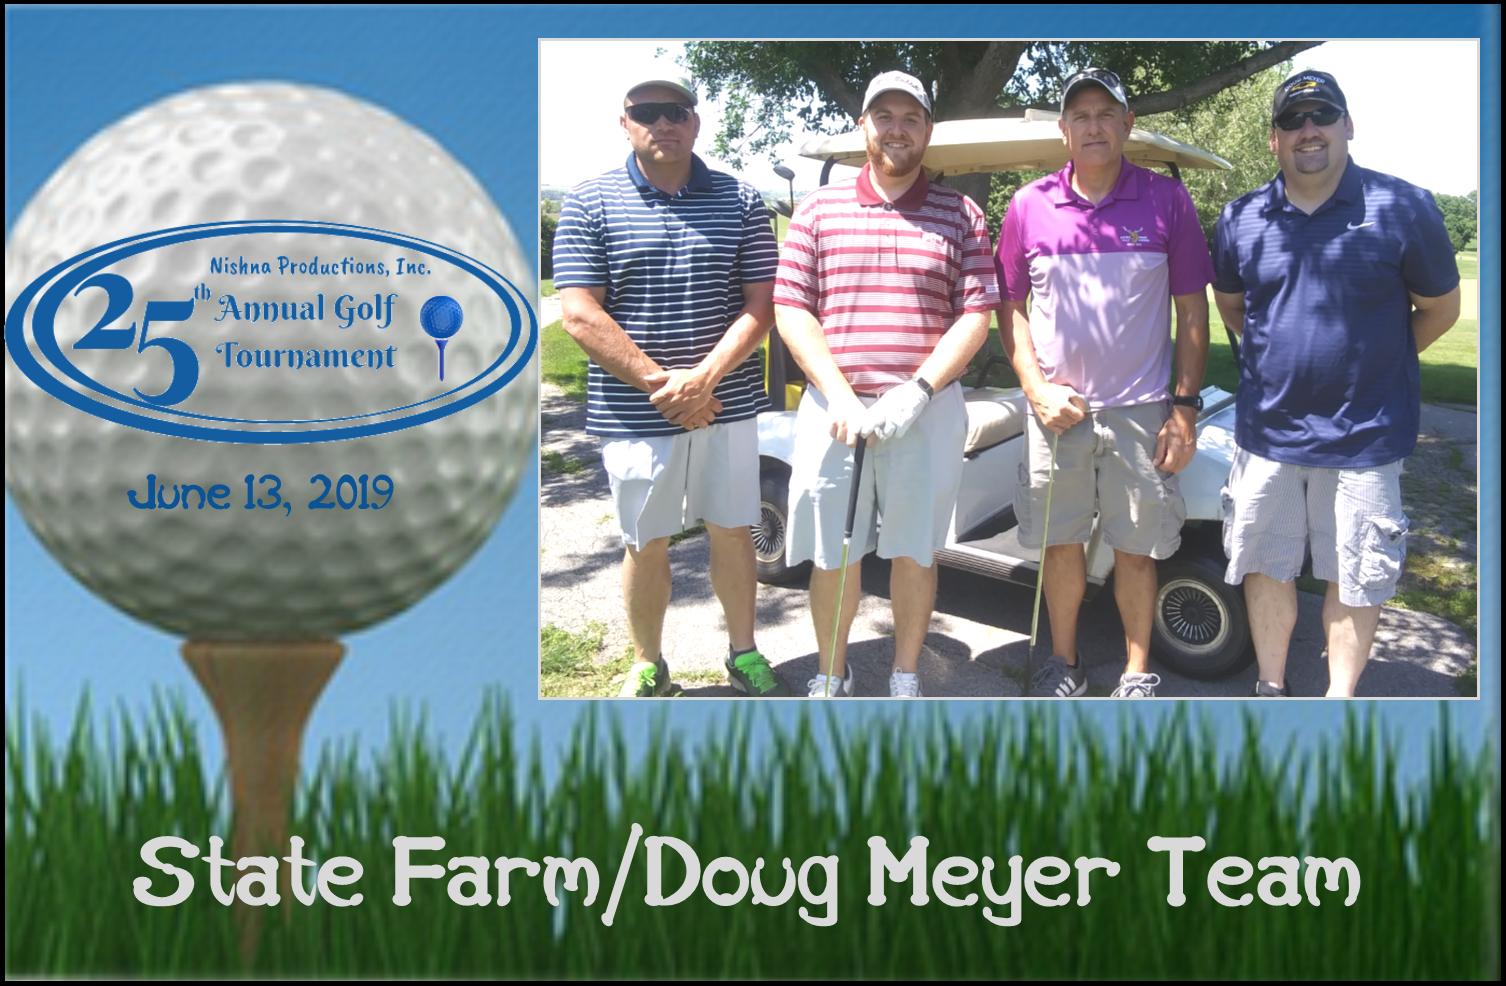 State Farm and Doug Meyer Team